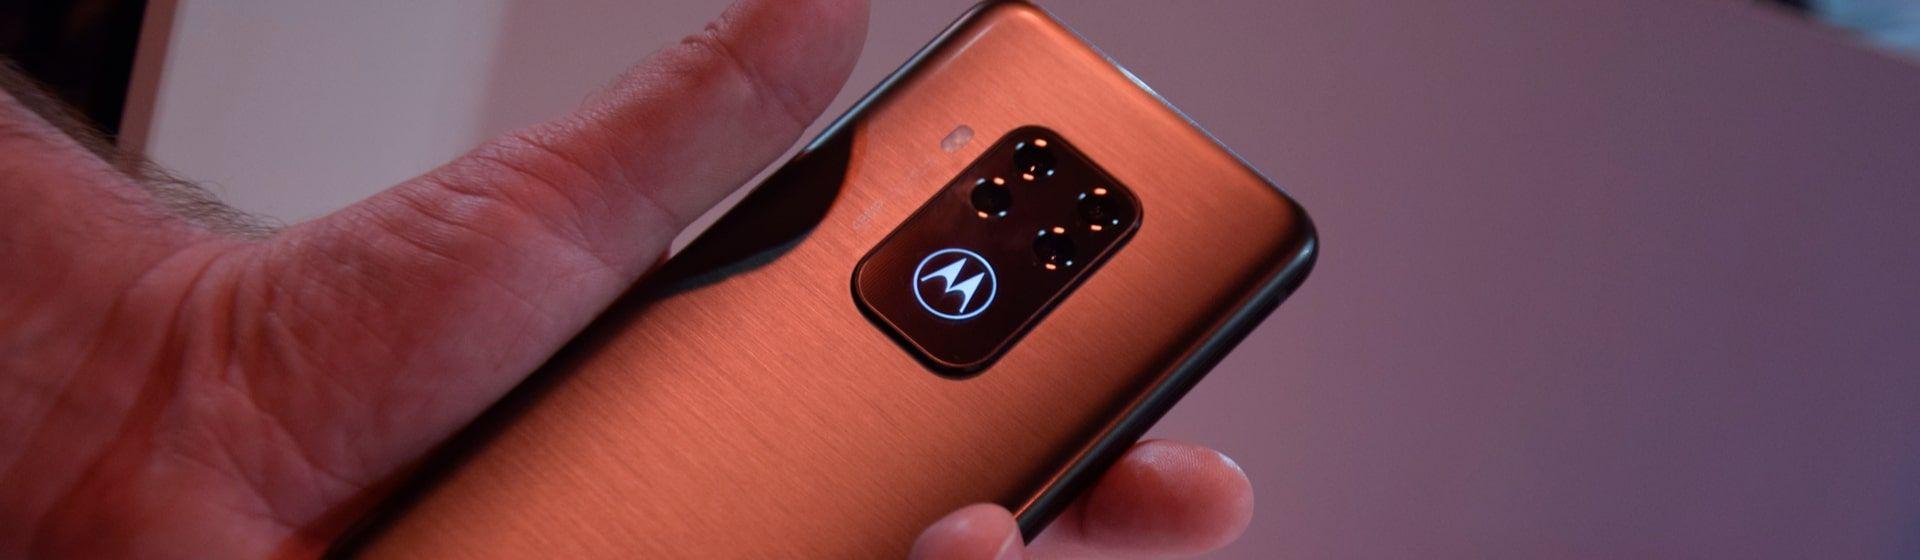 Linha Motorola One: o que muda entre Vision, Action, Zoom, Macro e Hyper?